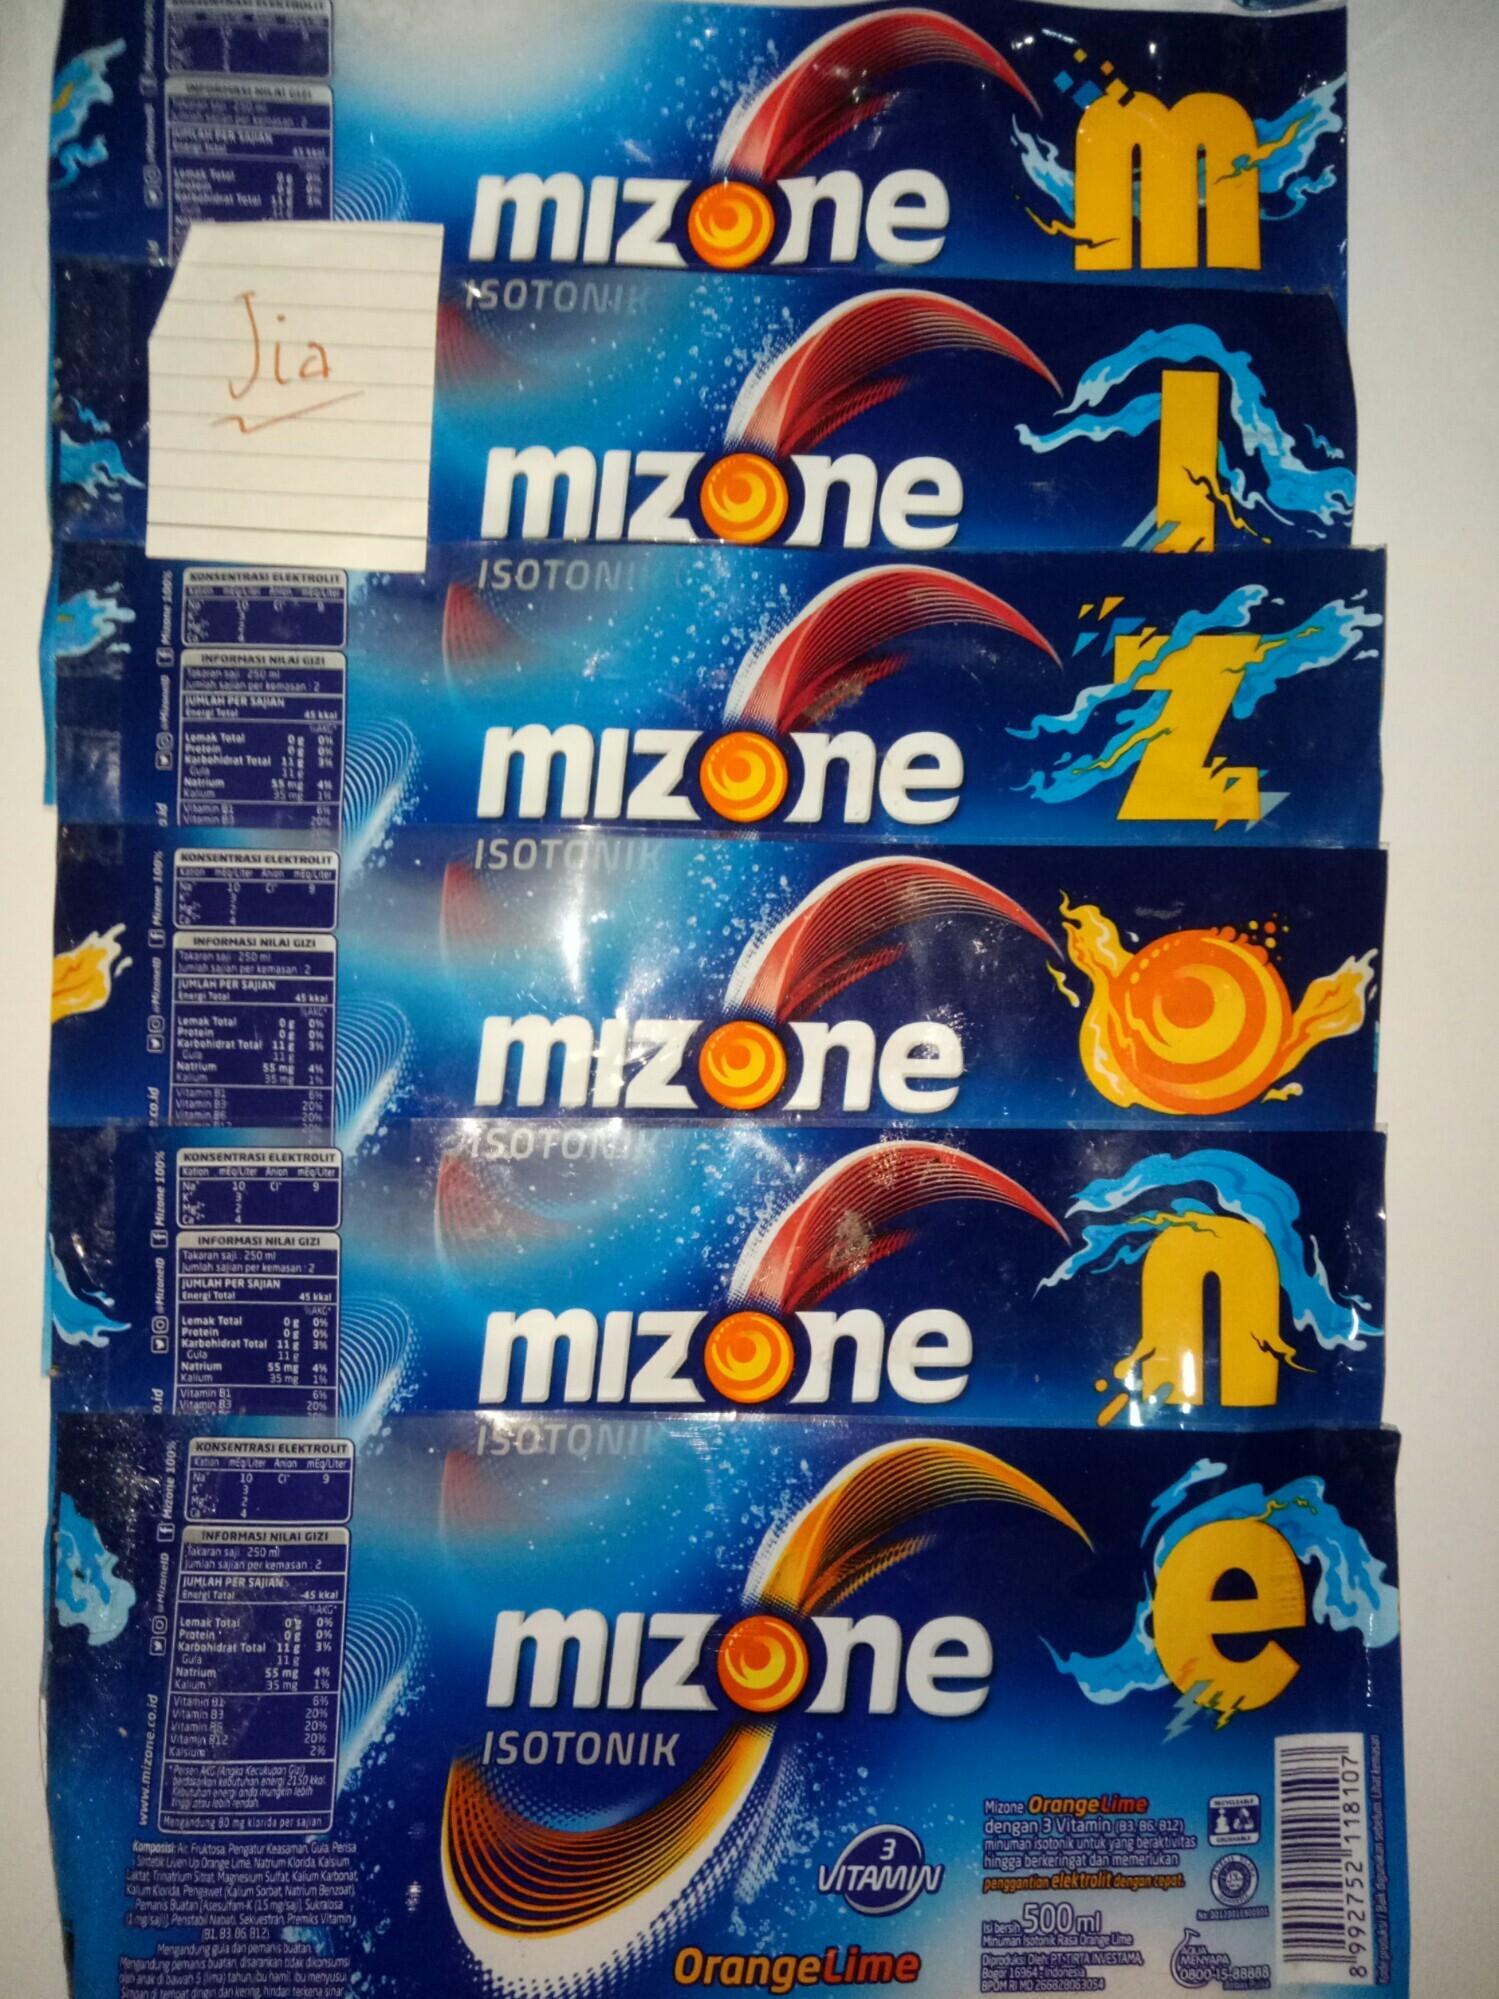 #KASKUSxMizone Mizone, Mantapkan Tekadmu